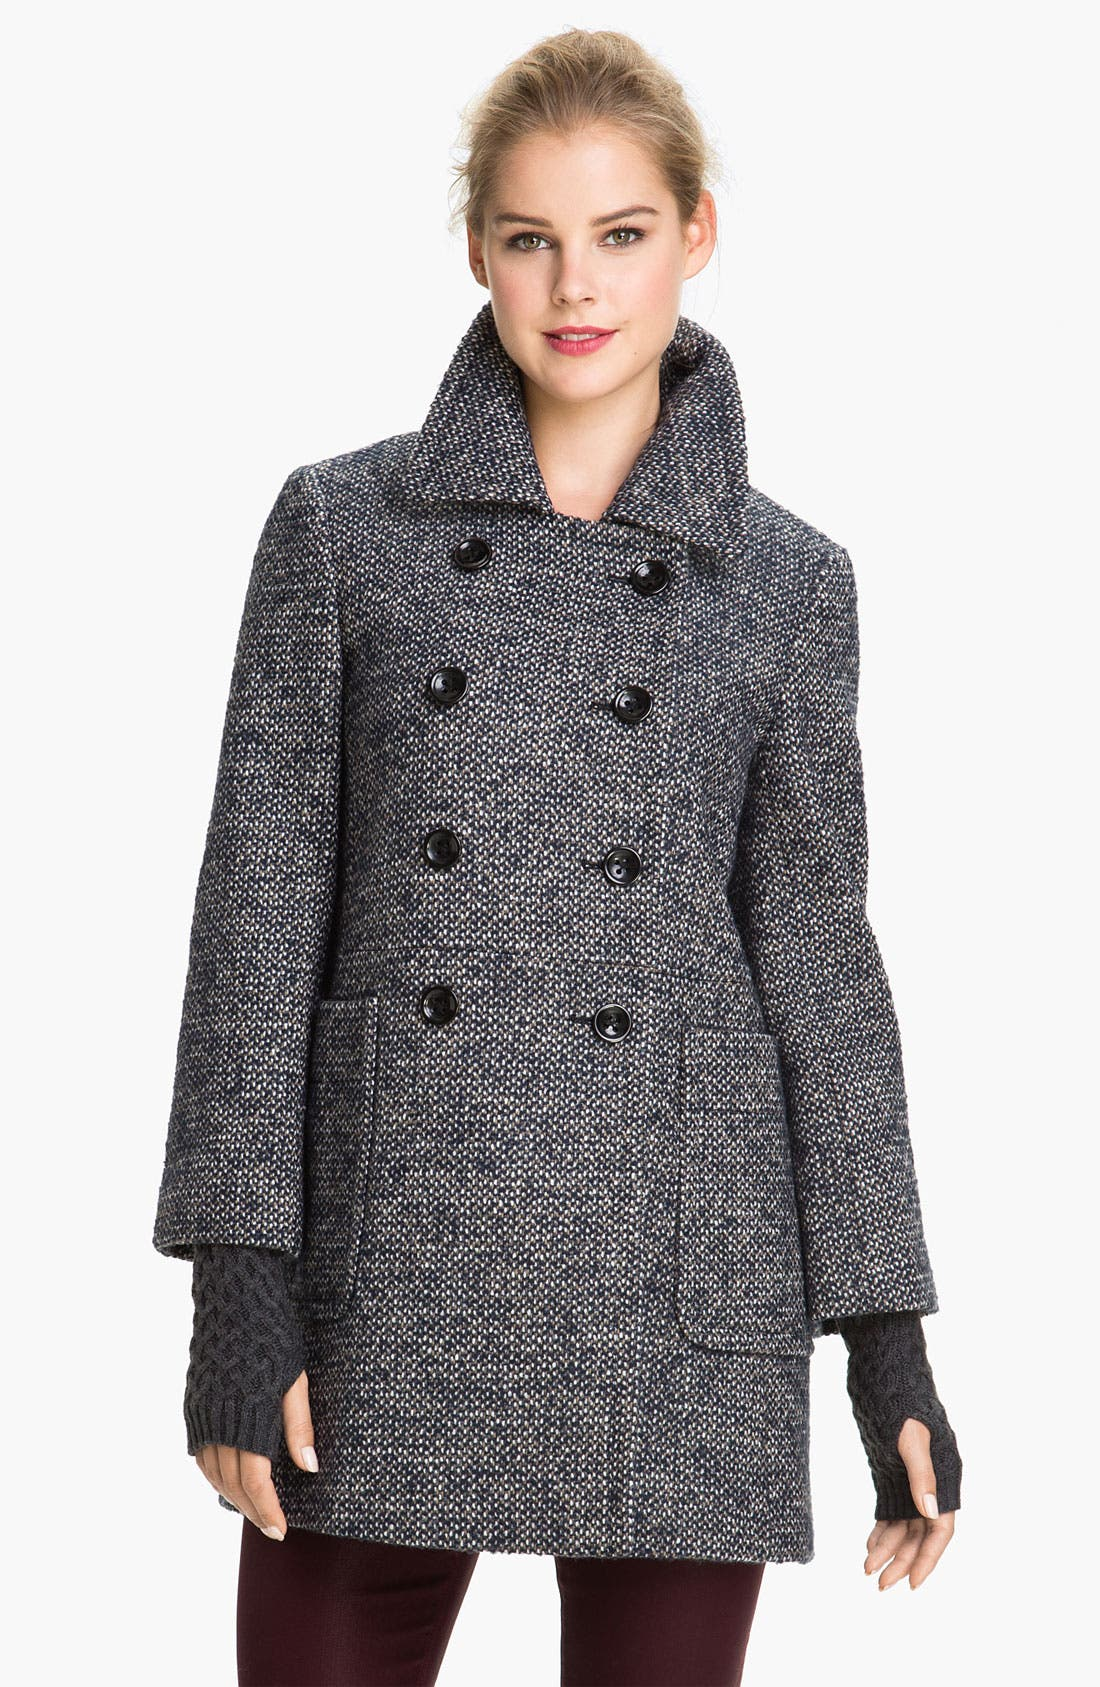 Alternate Image 1 Selected - Calvin Klein Double Breasted Tweed Coat